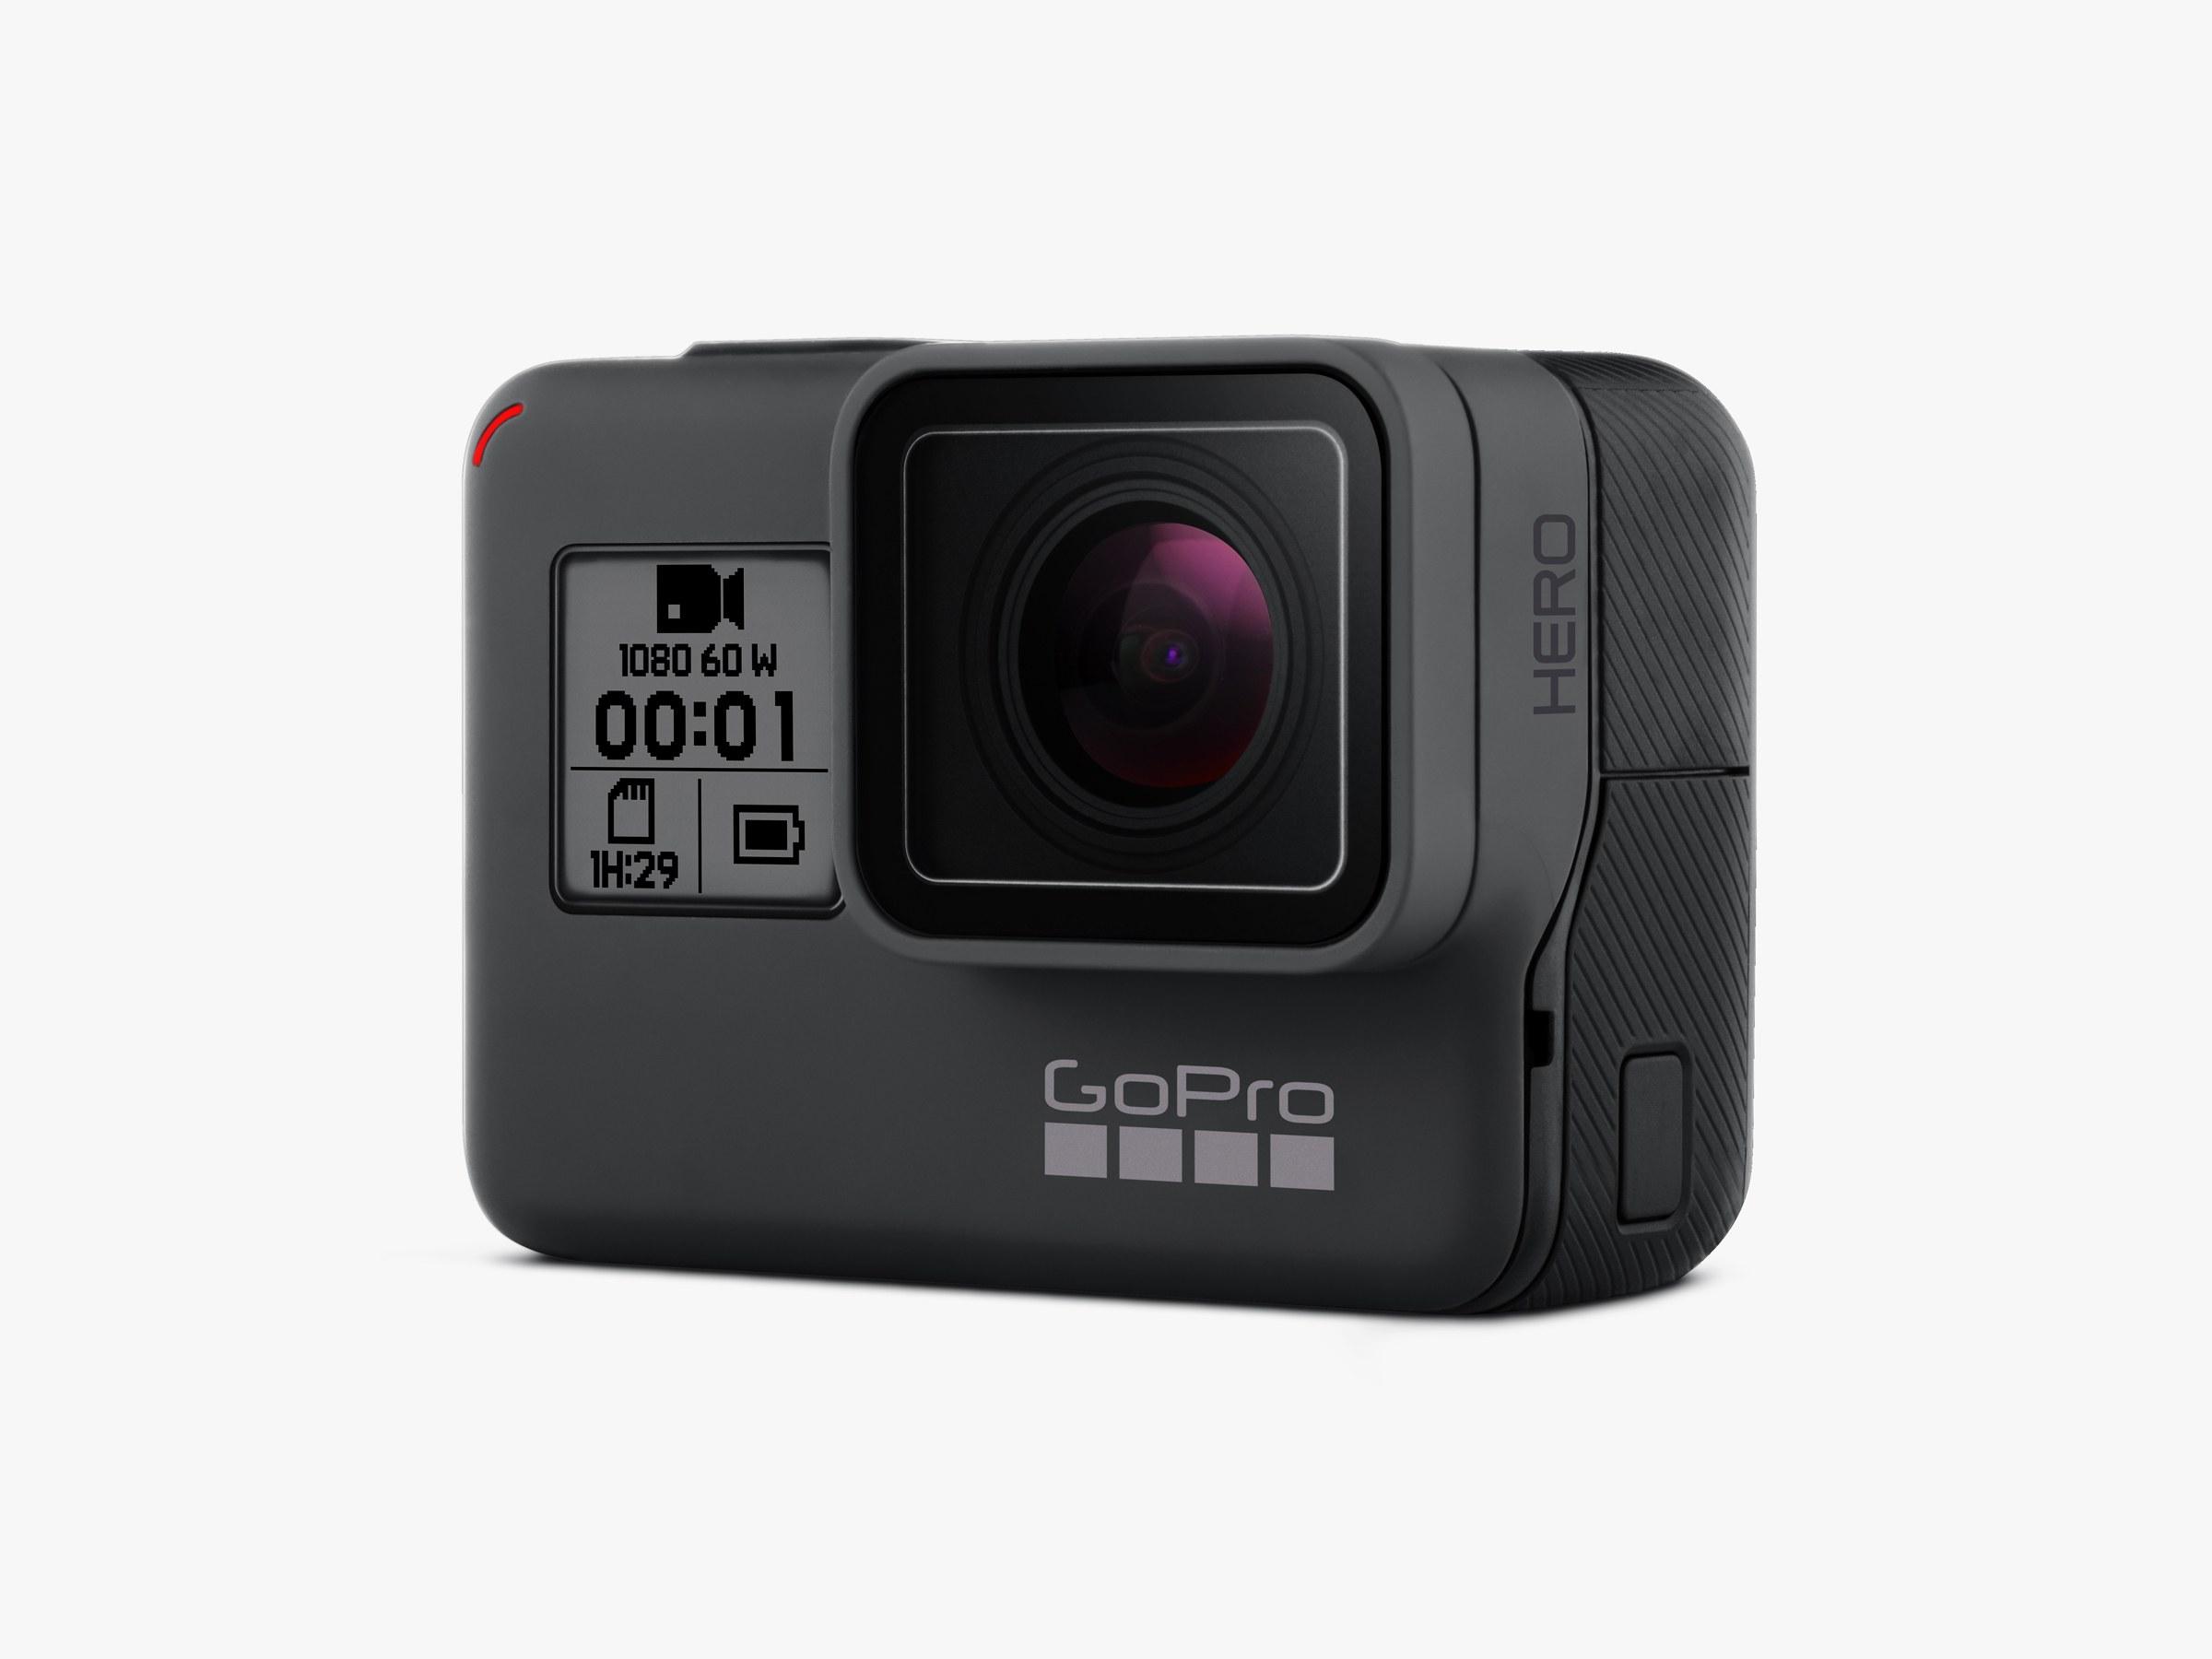 GoPro Hero Camera The 6 Best Waterproof Gadgets for Summer 2018